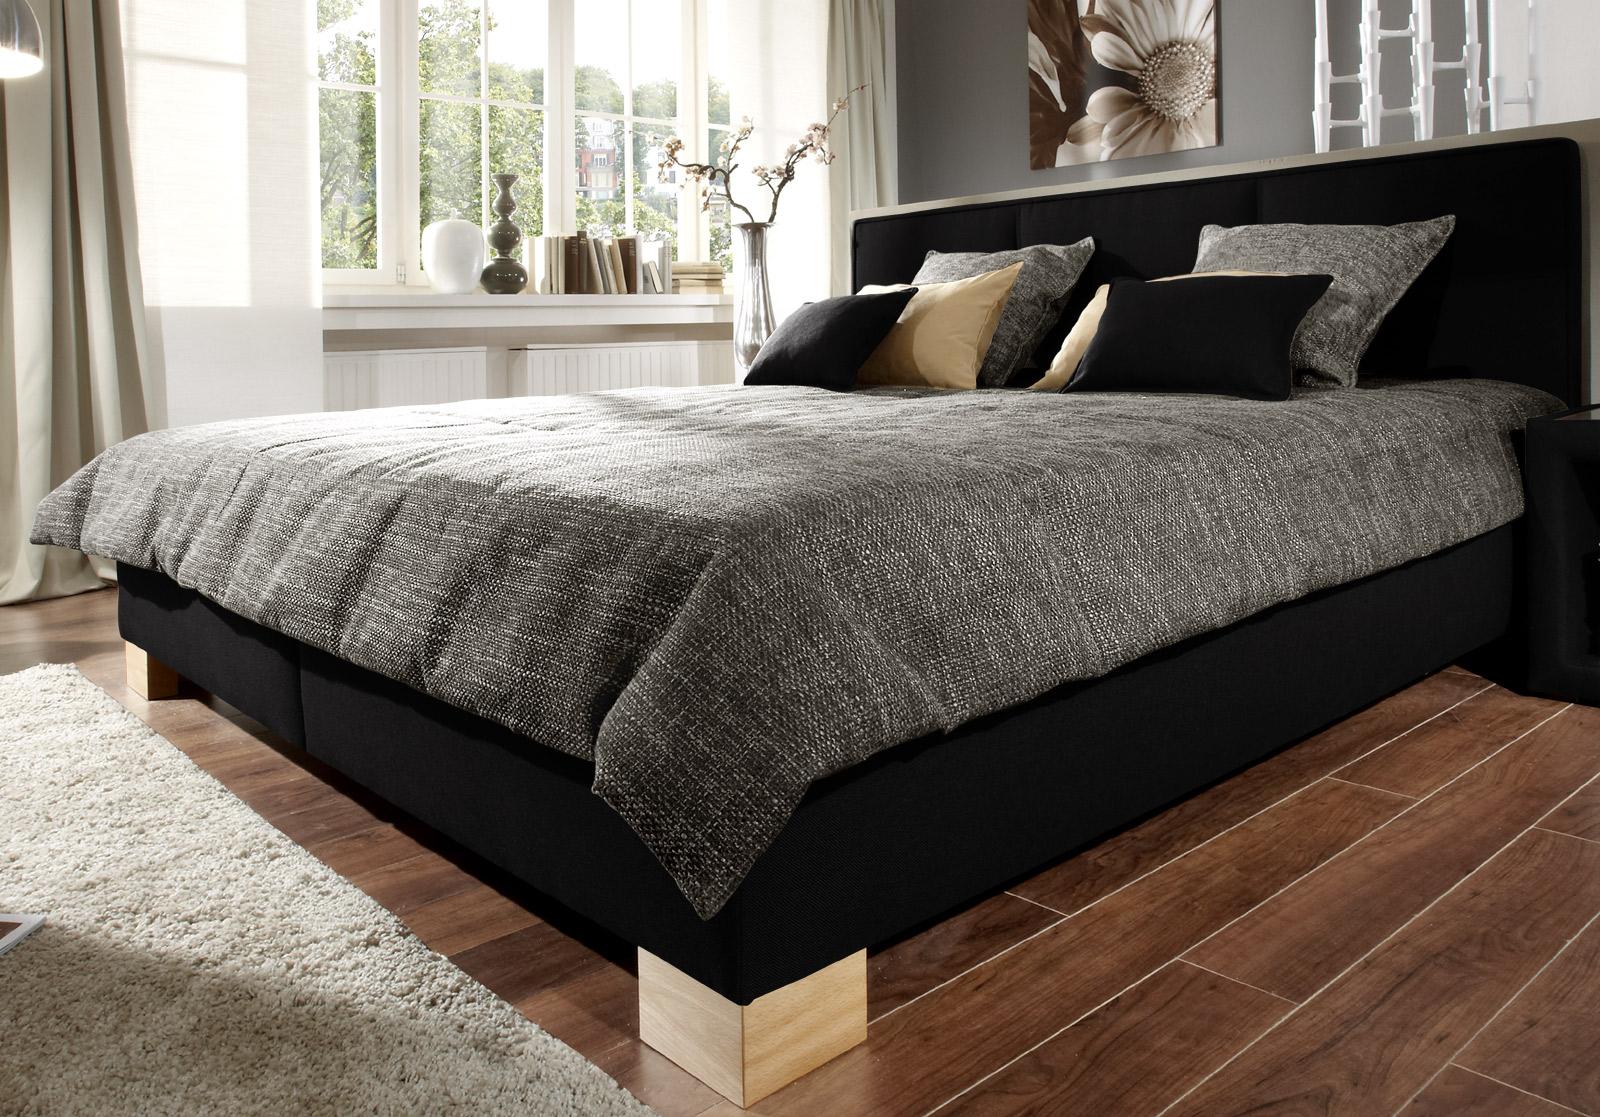 tagesdecke in braun und grau f r doppelbetten quintino. Black Bedroom Furniture Sets. Home Design Ideas